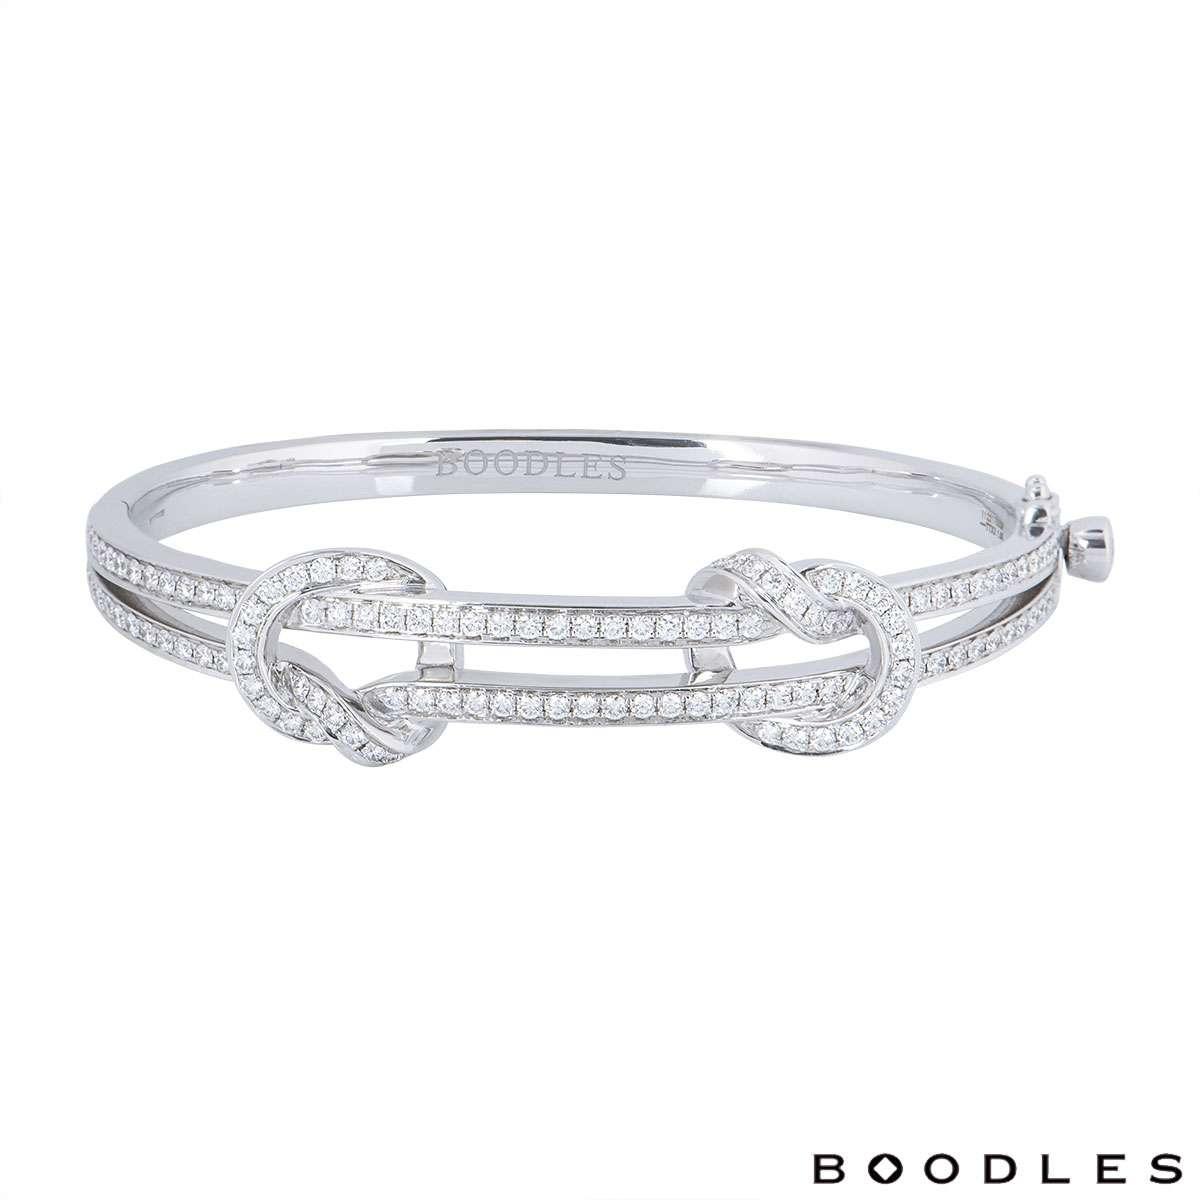 Boodles White Gold The Knot Diamond Bangle Rich Diamonds